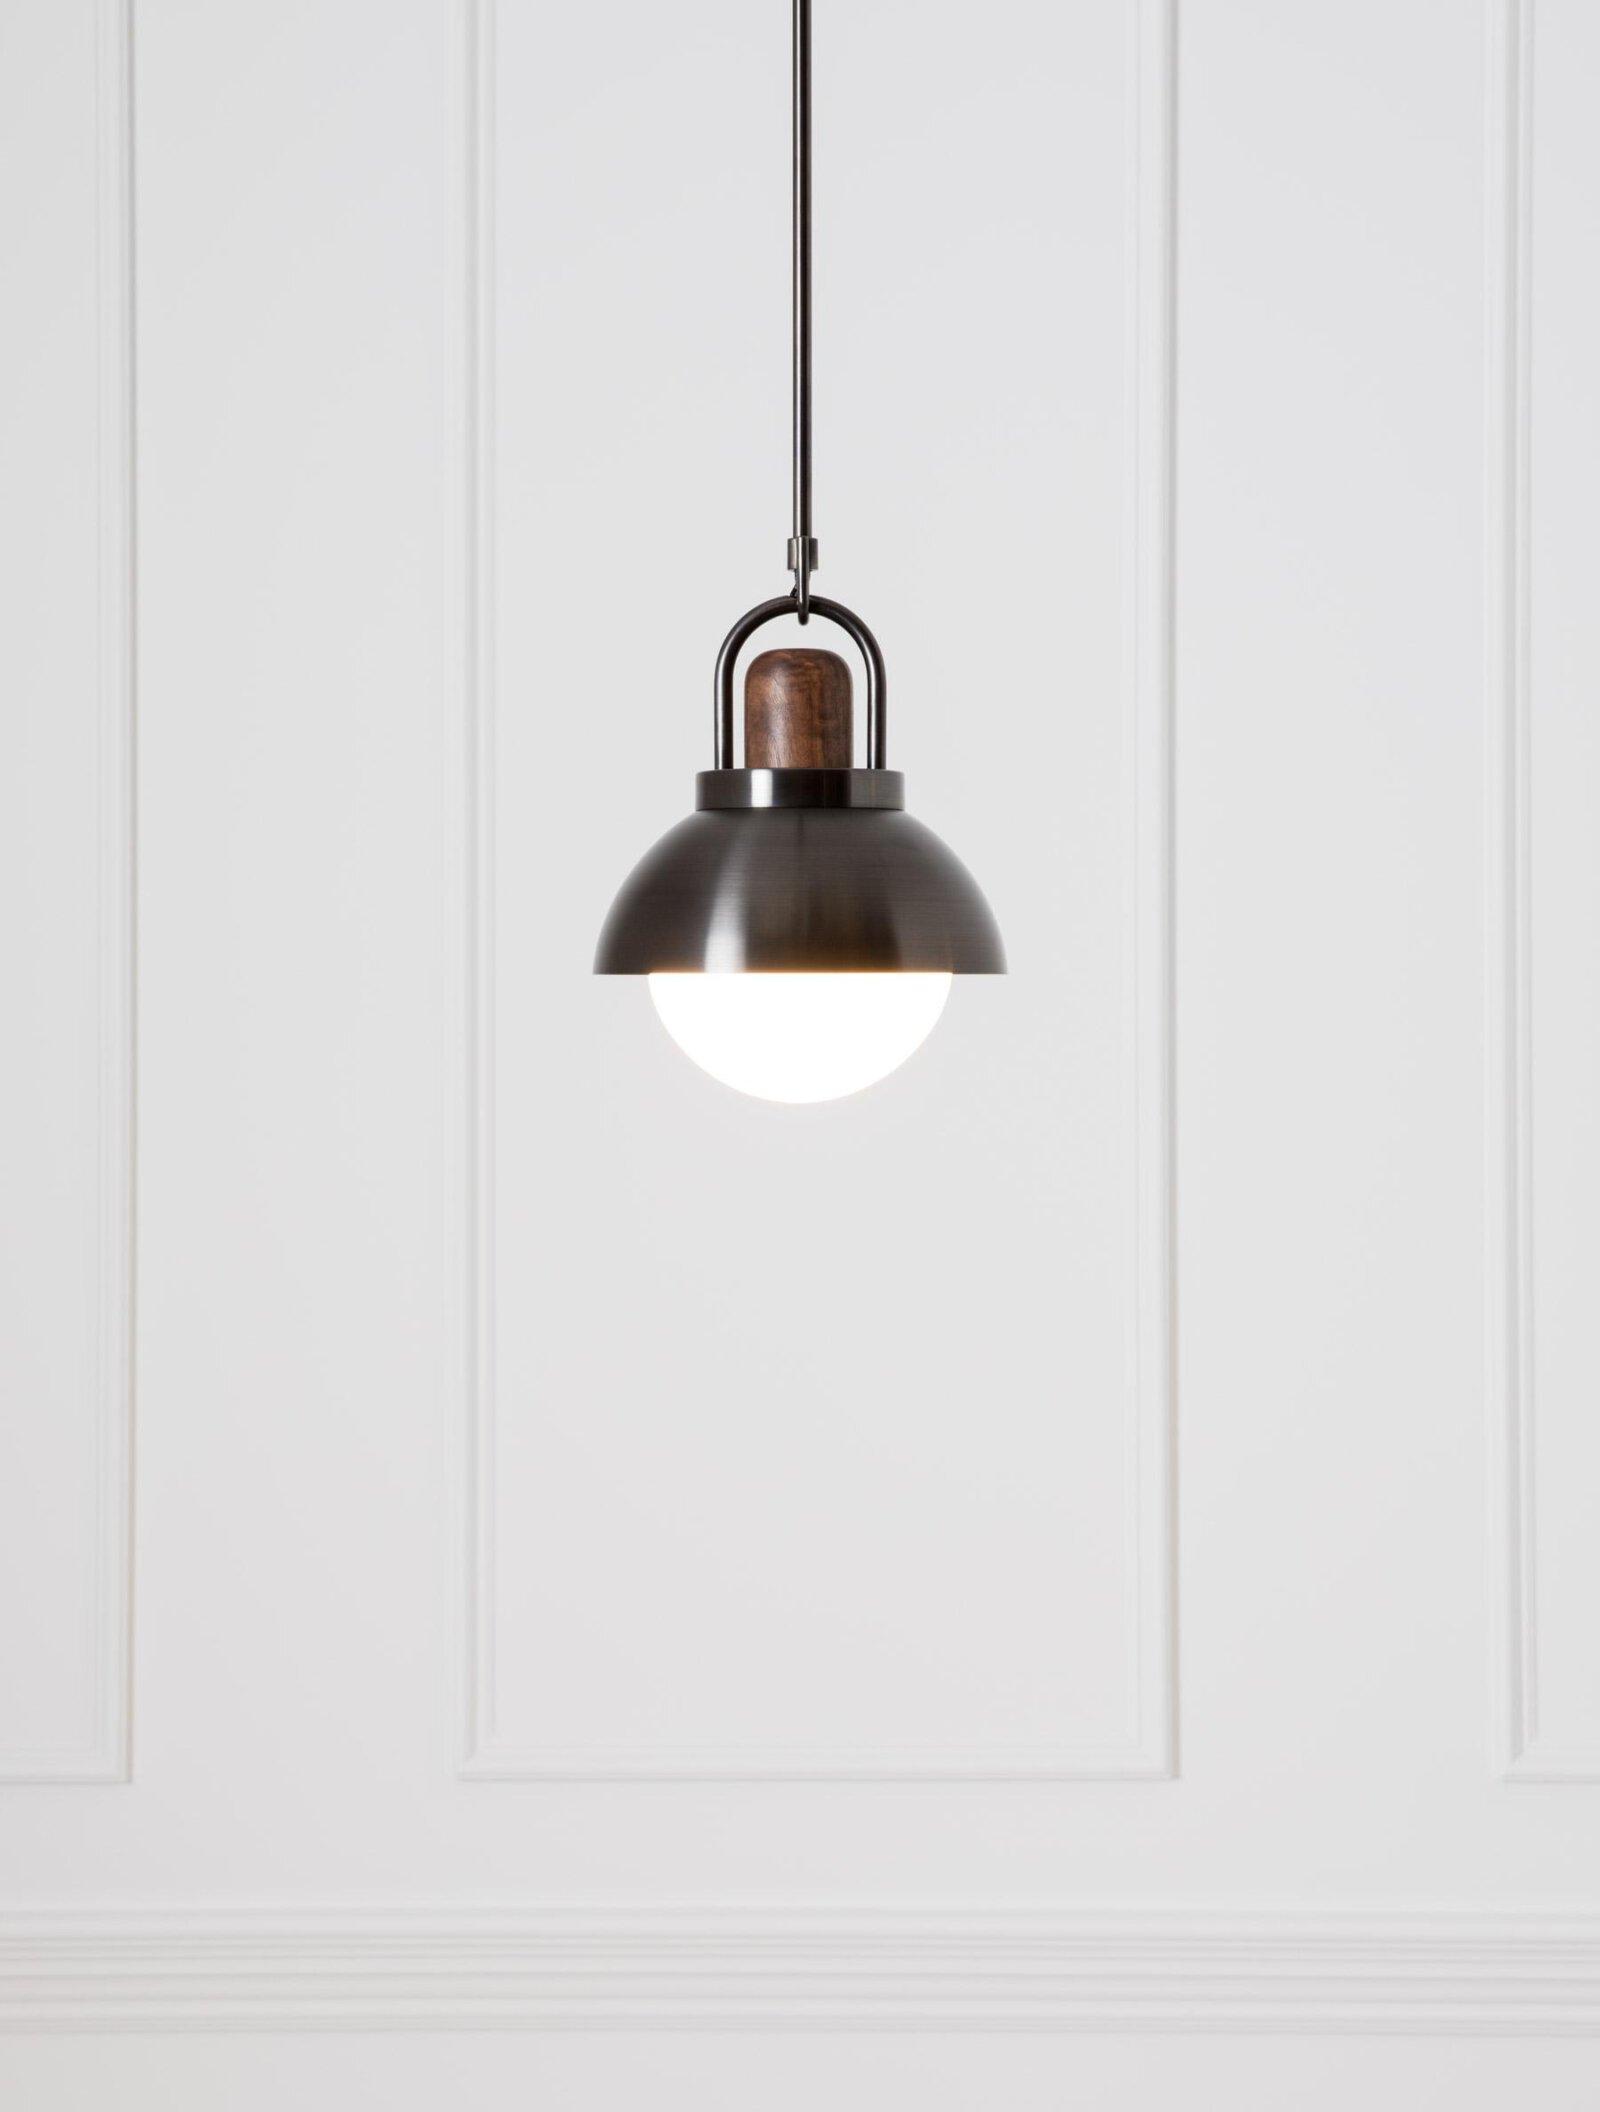 TinnappelMetz-allied-maker-arc-dome-pendant-01